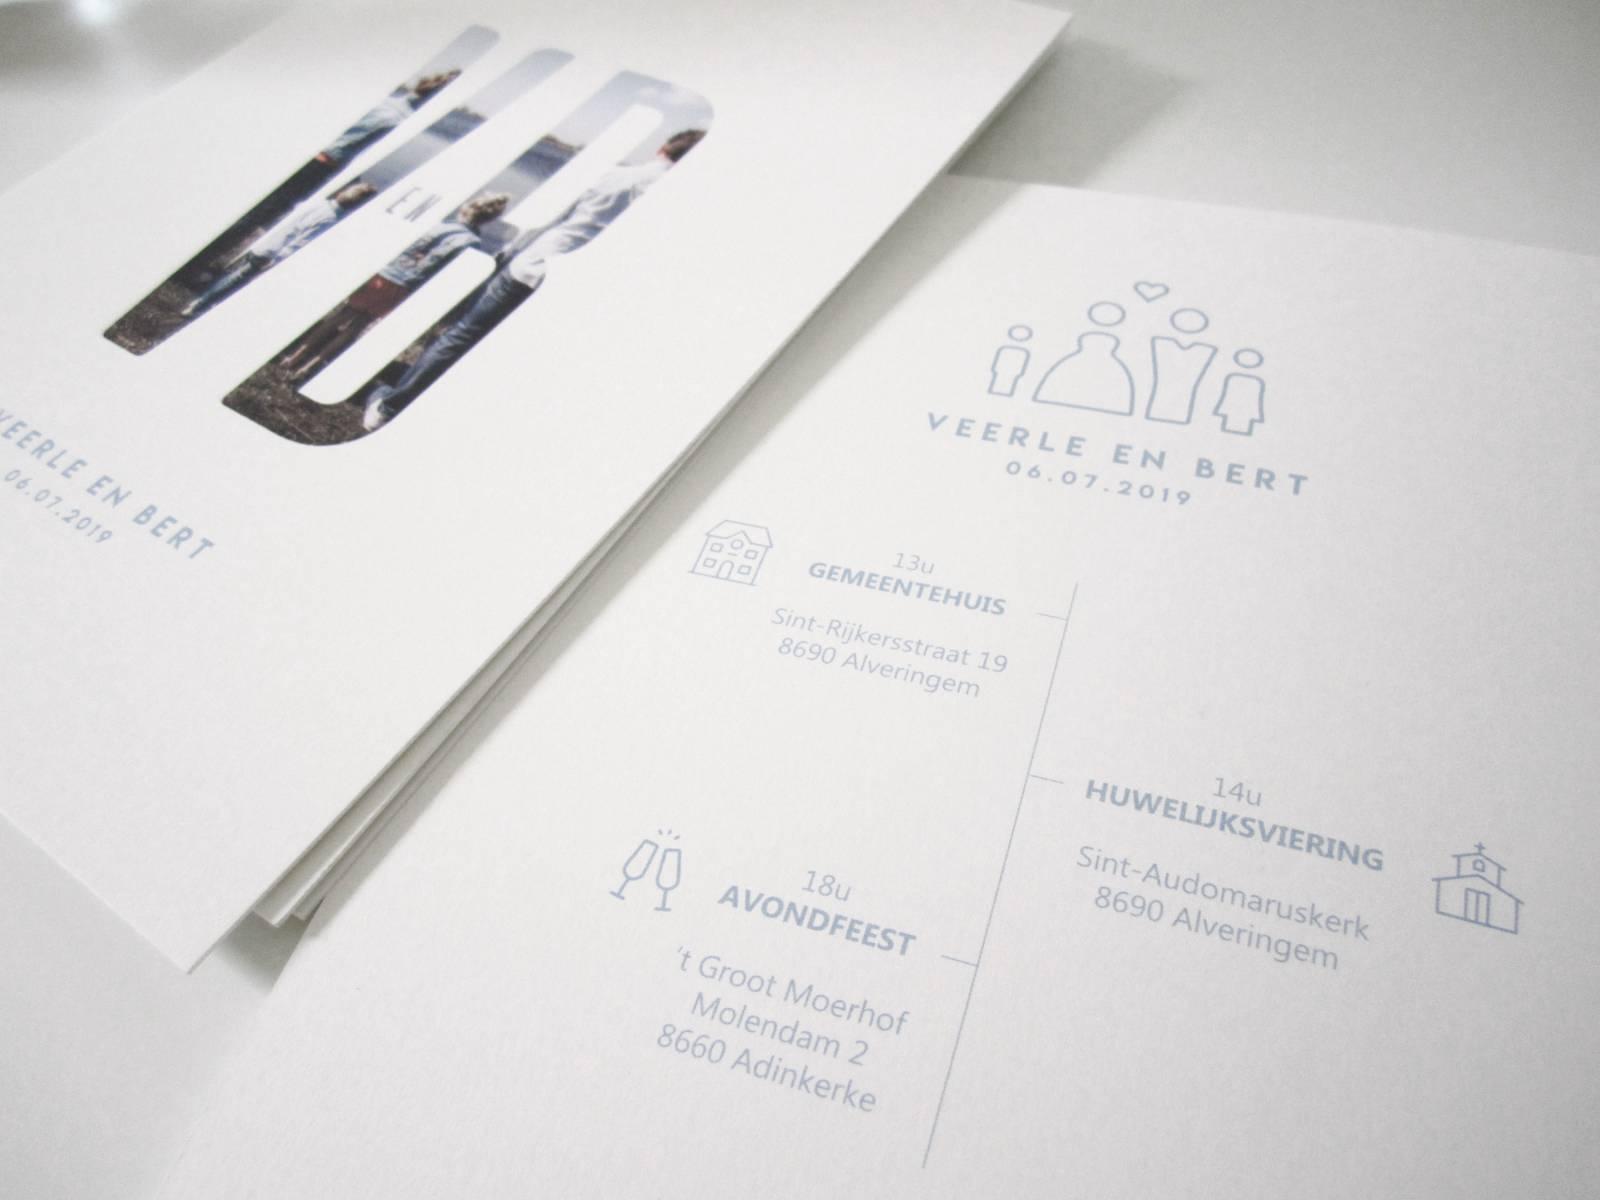 PlanMien - Trouwuitnodigingen en drukwerk - House of Weddings (12)